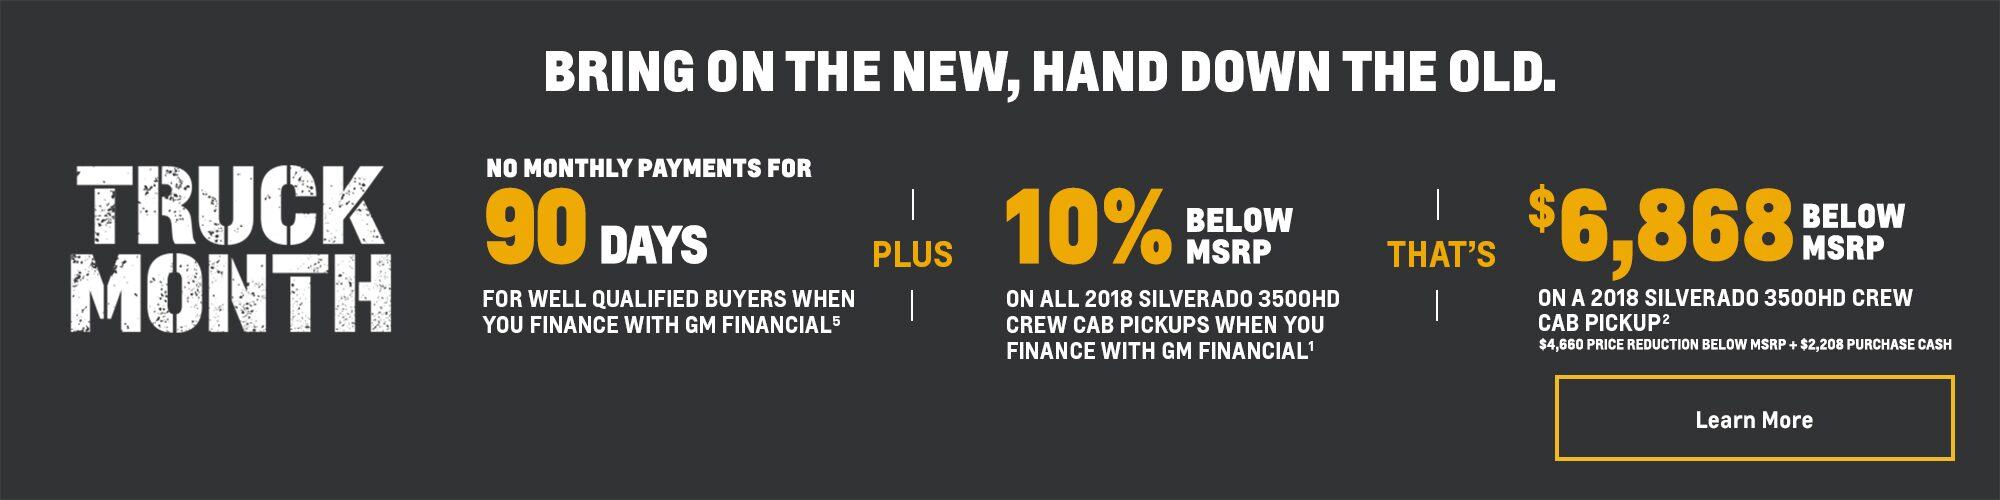 Truck Month Offers: Silverado 3500HD Pickups - 10% Below MSRP